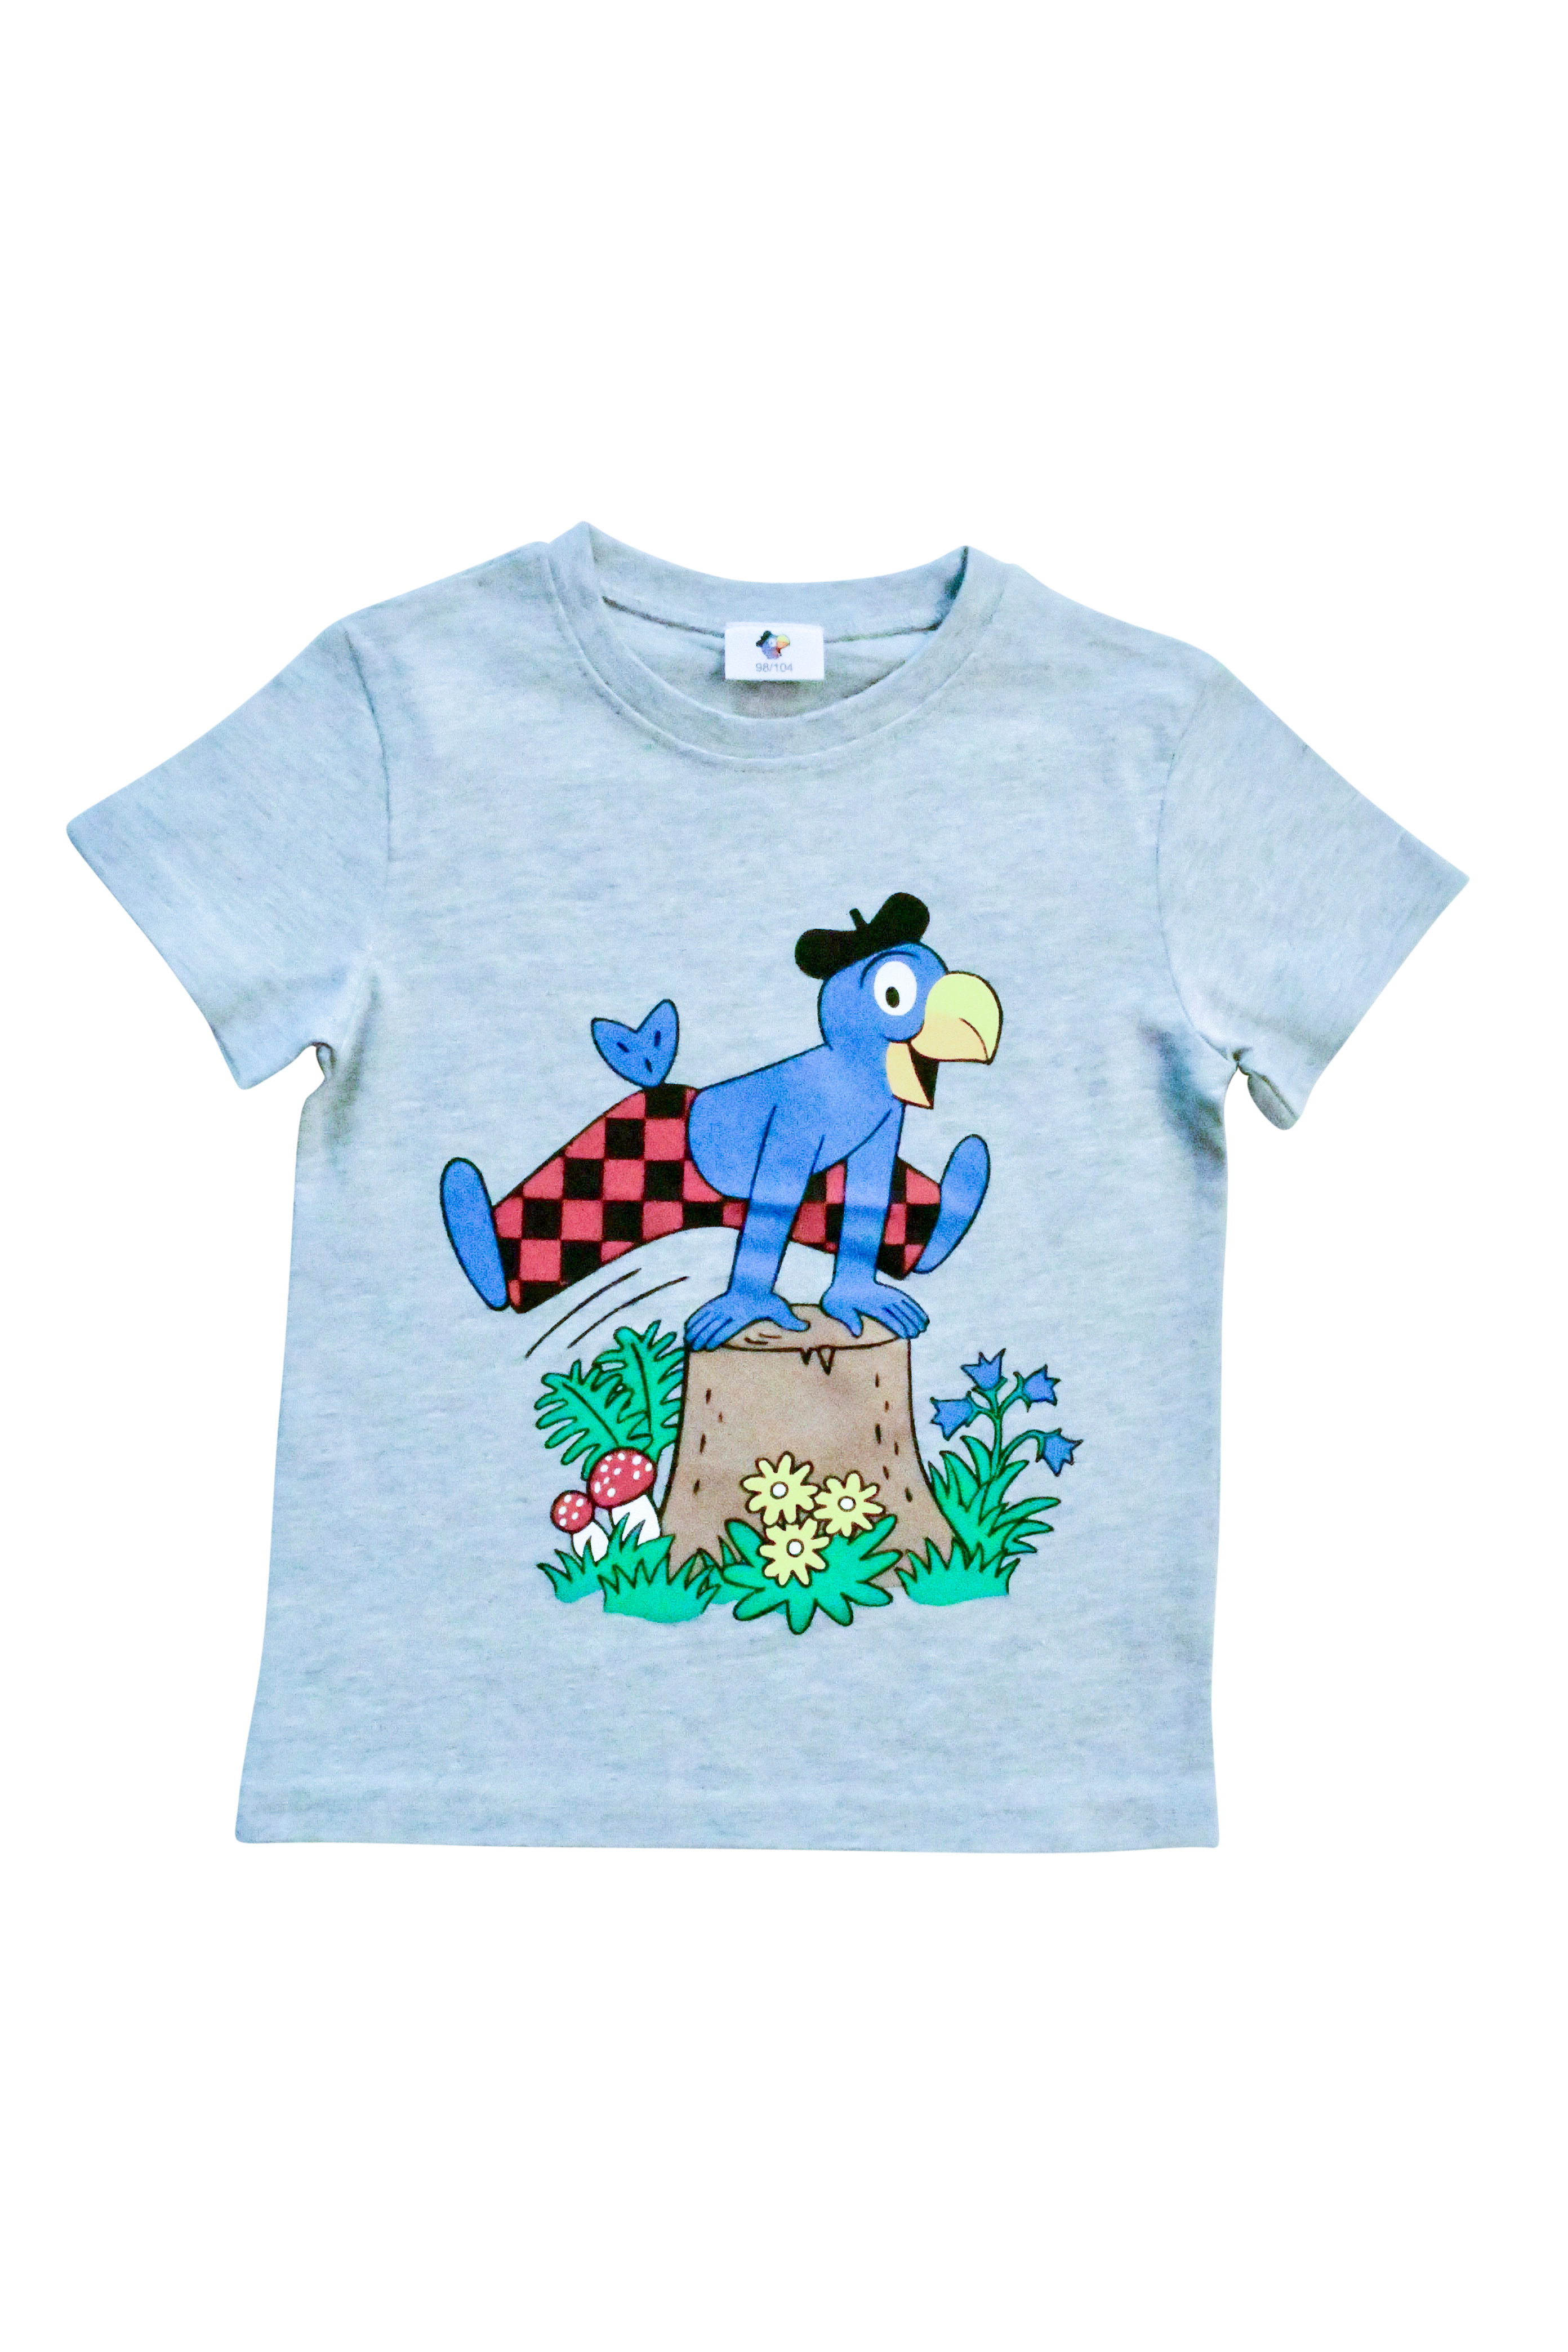 Globi T-Shirt grau Sprung 110/116